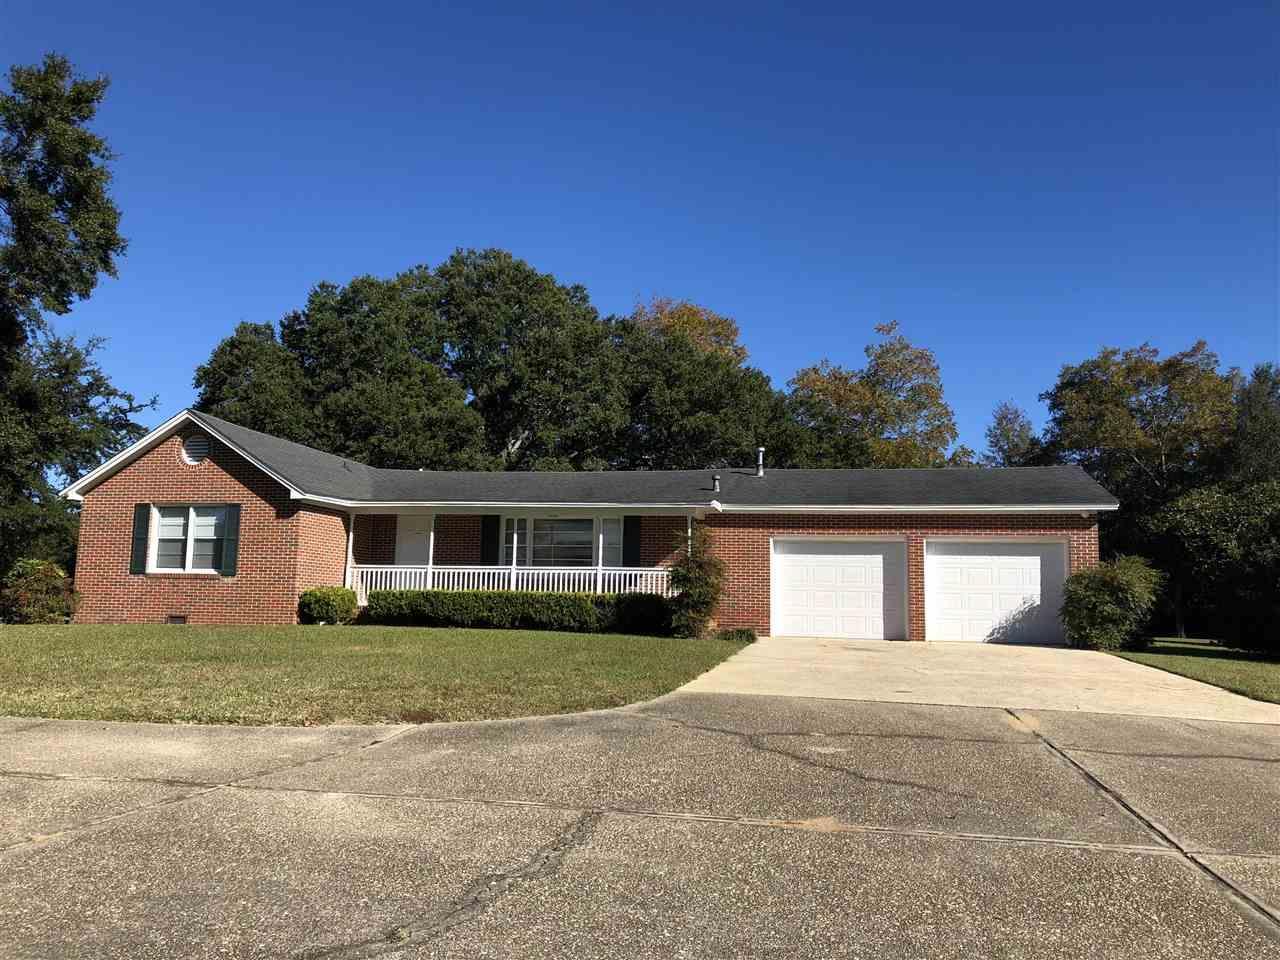 9750 Hillview Dr, Pensacola, FL 32514